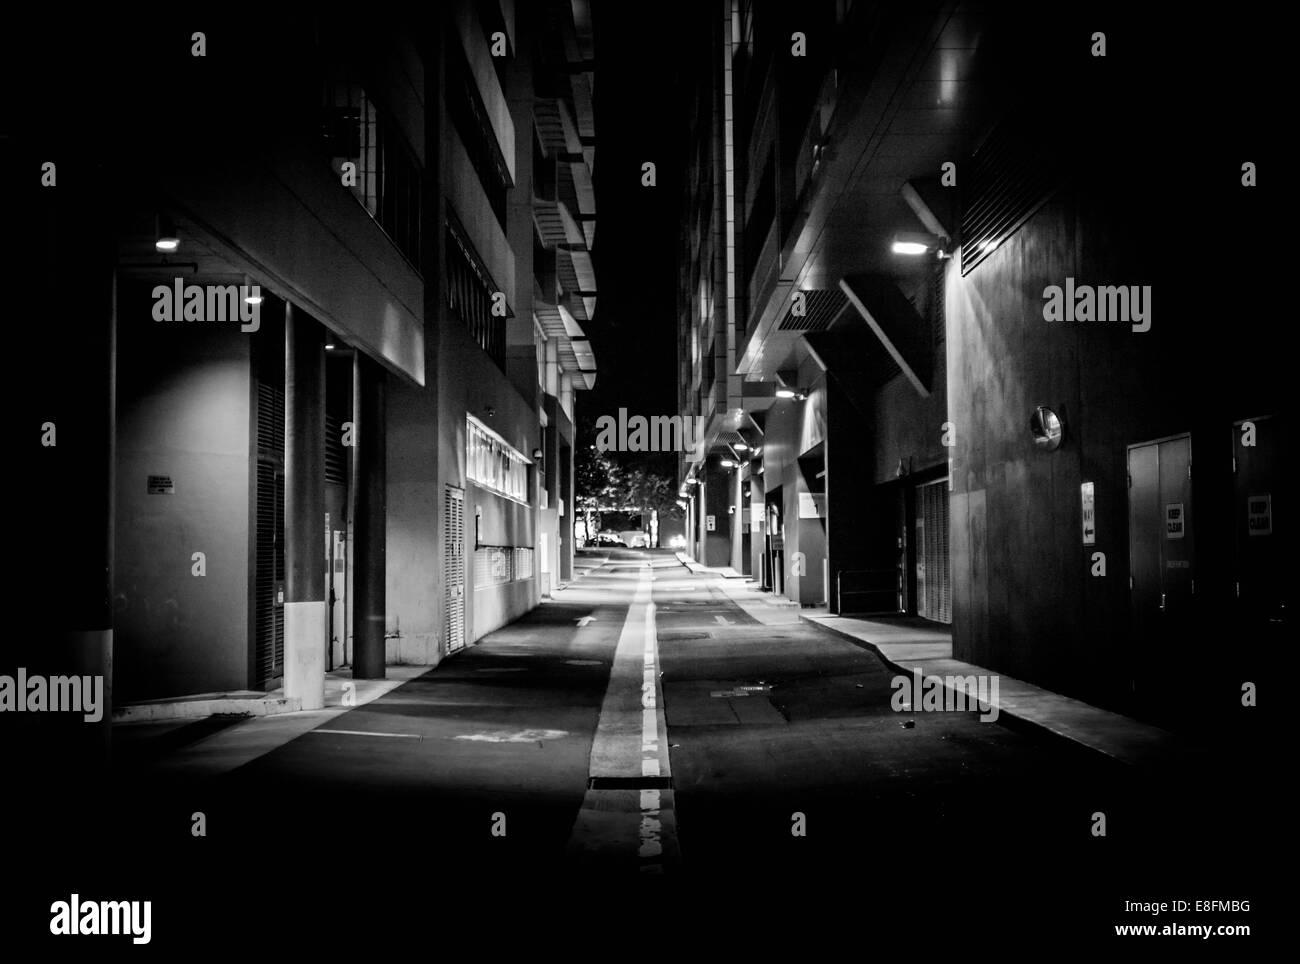 Street lights illuminating an alley, Acton, Canberra, Australia - Stock Image